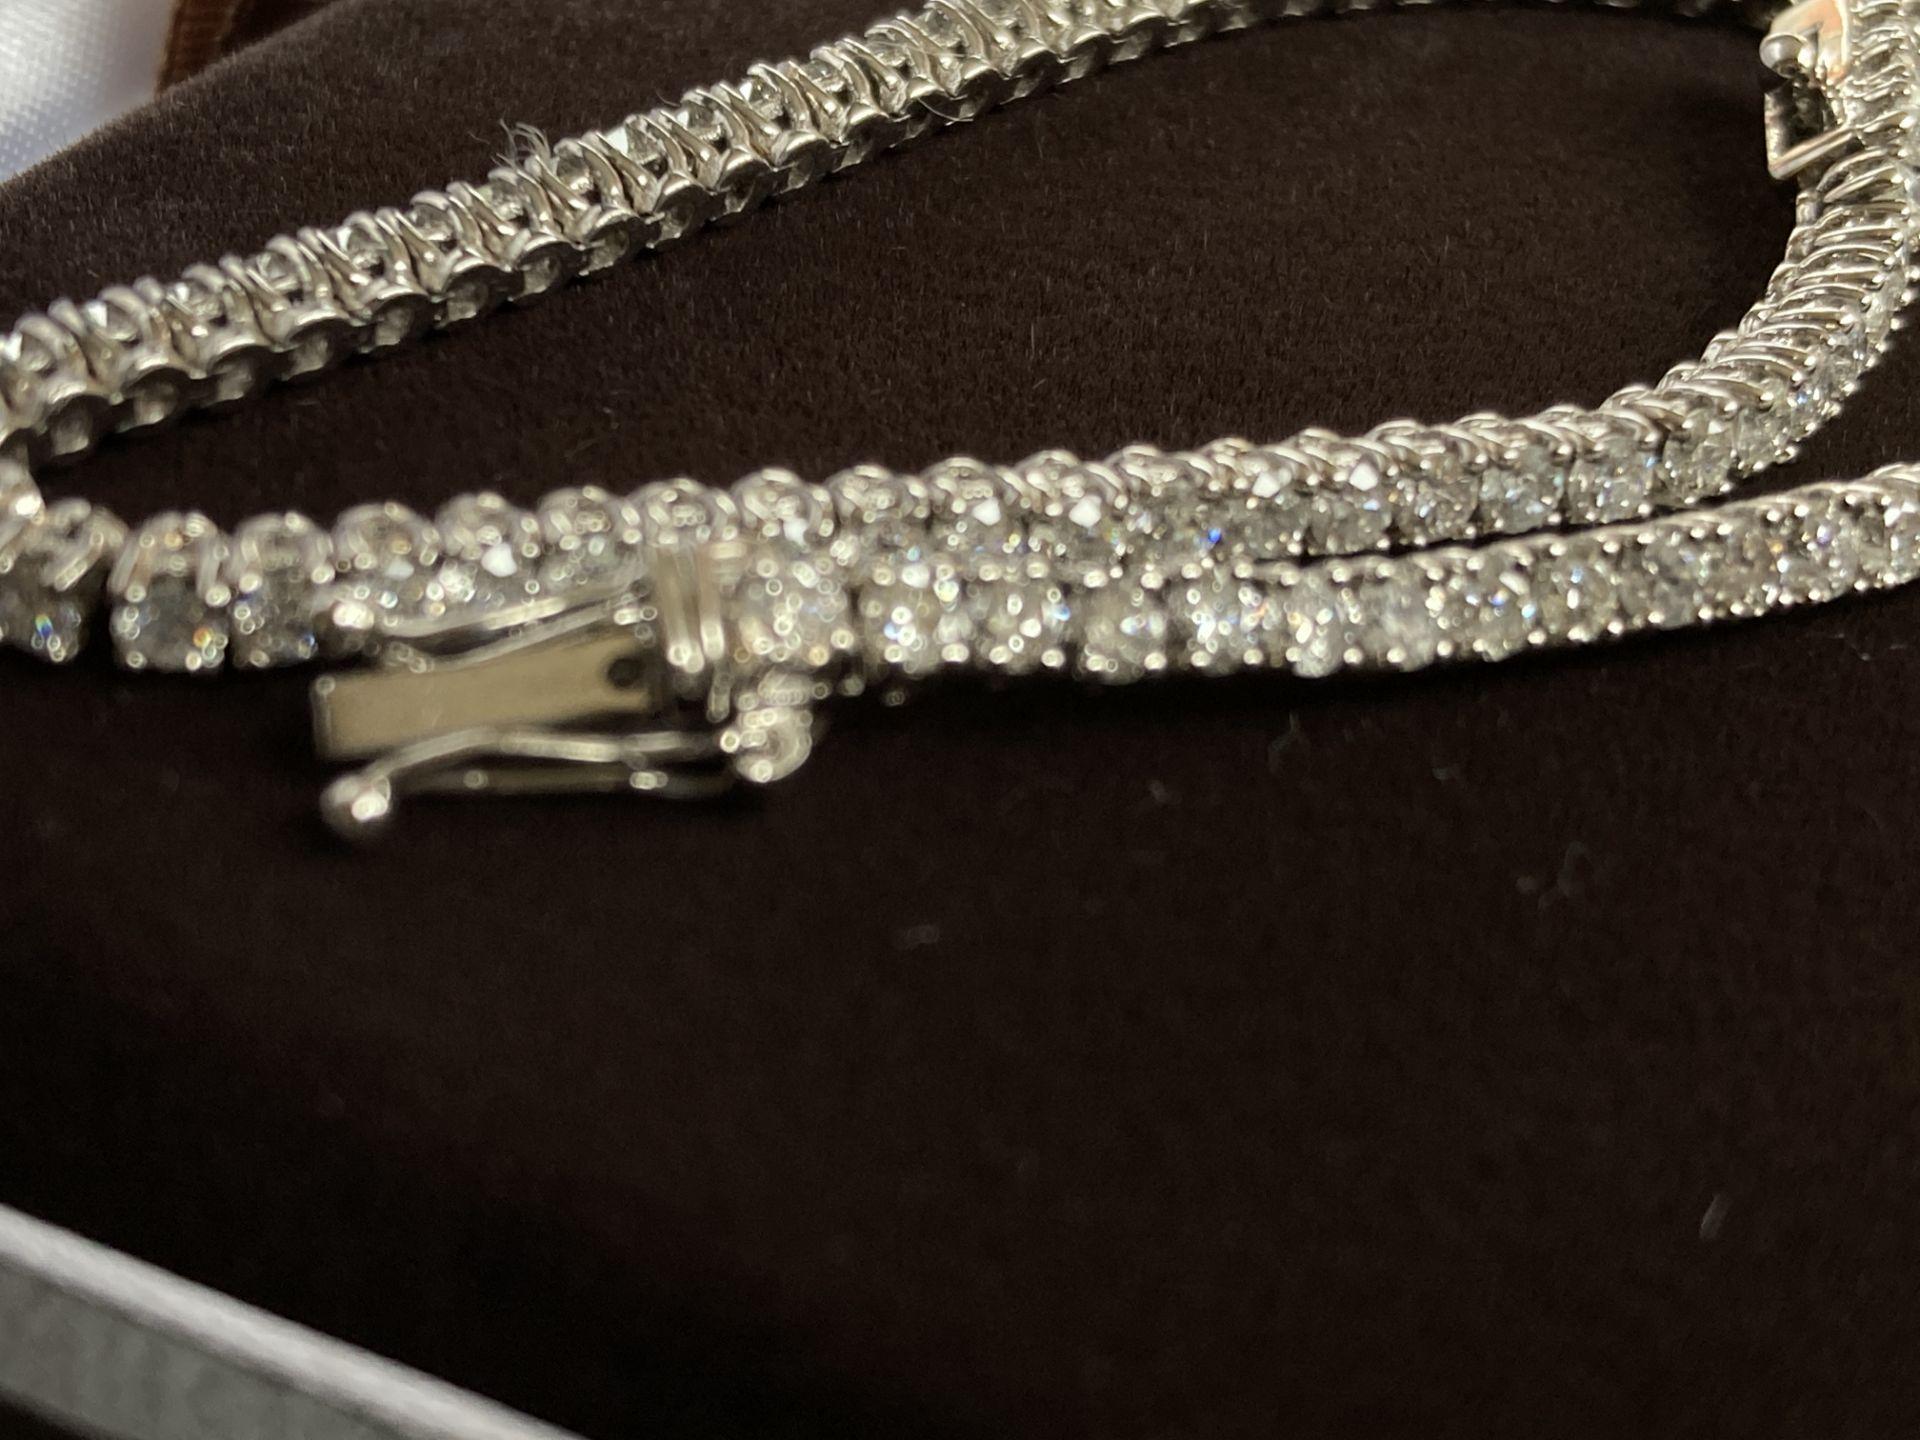 18CT WHITE GOLD 3.2-3.5CT DIAMOND TENNIS BRACELET - Image 5 of 7